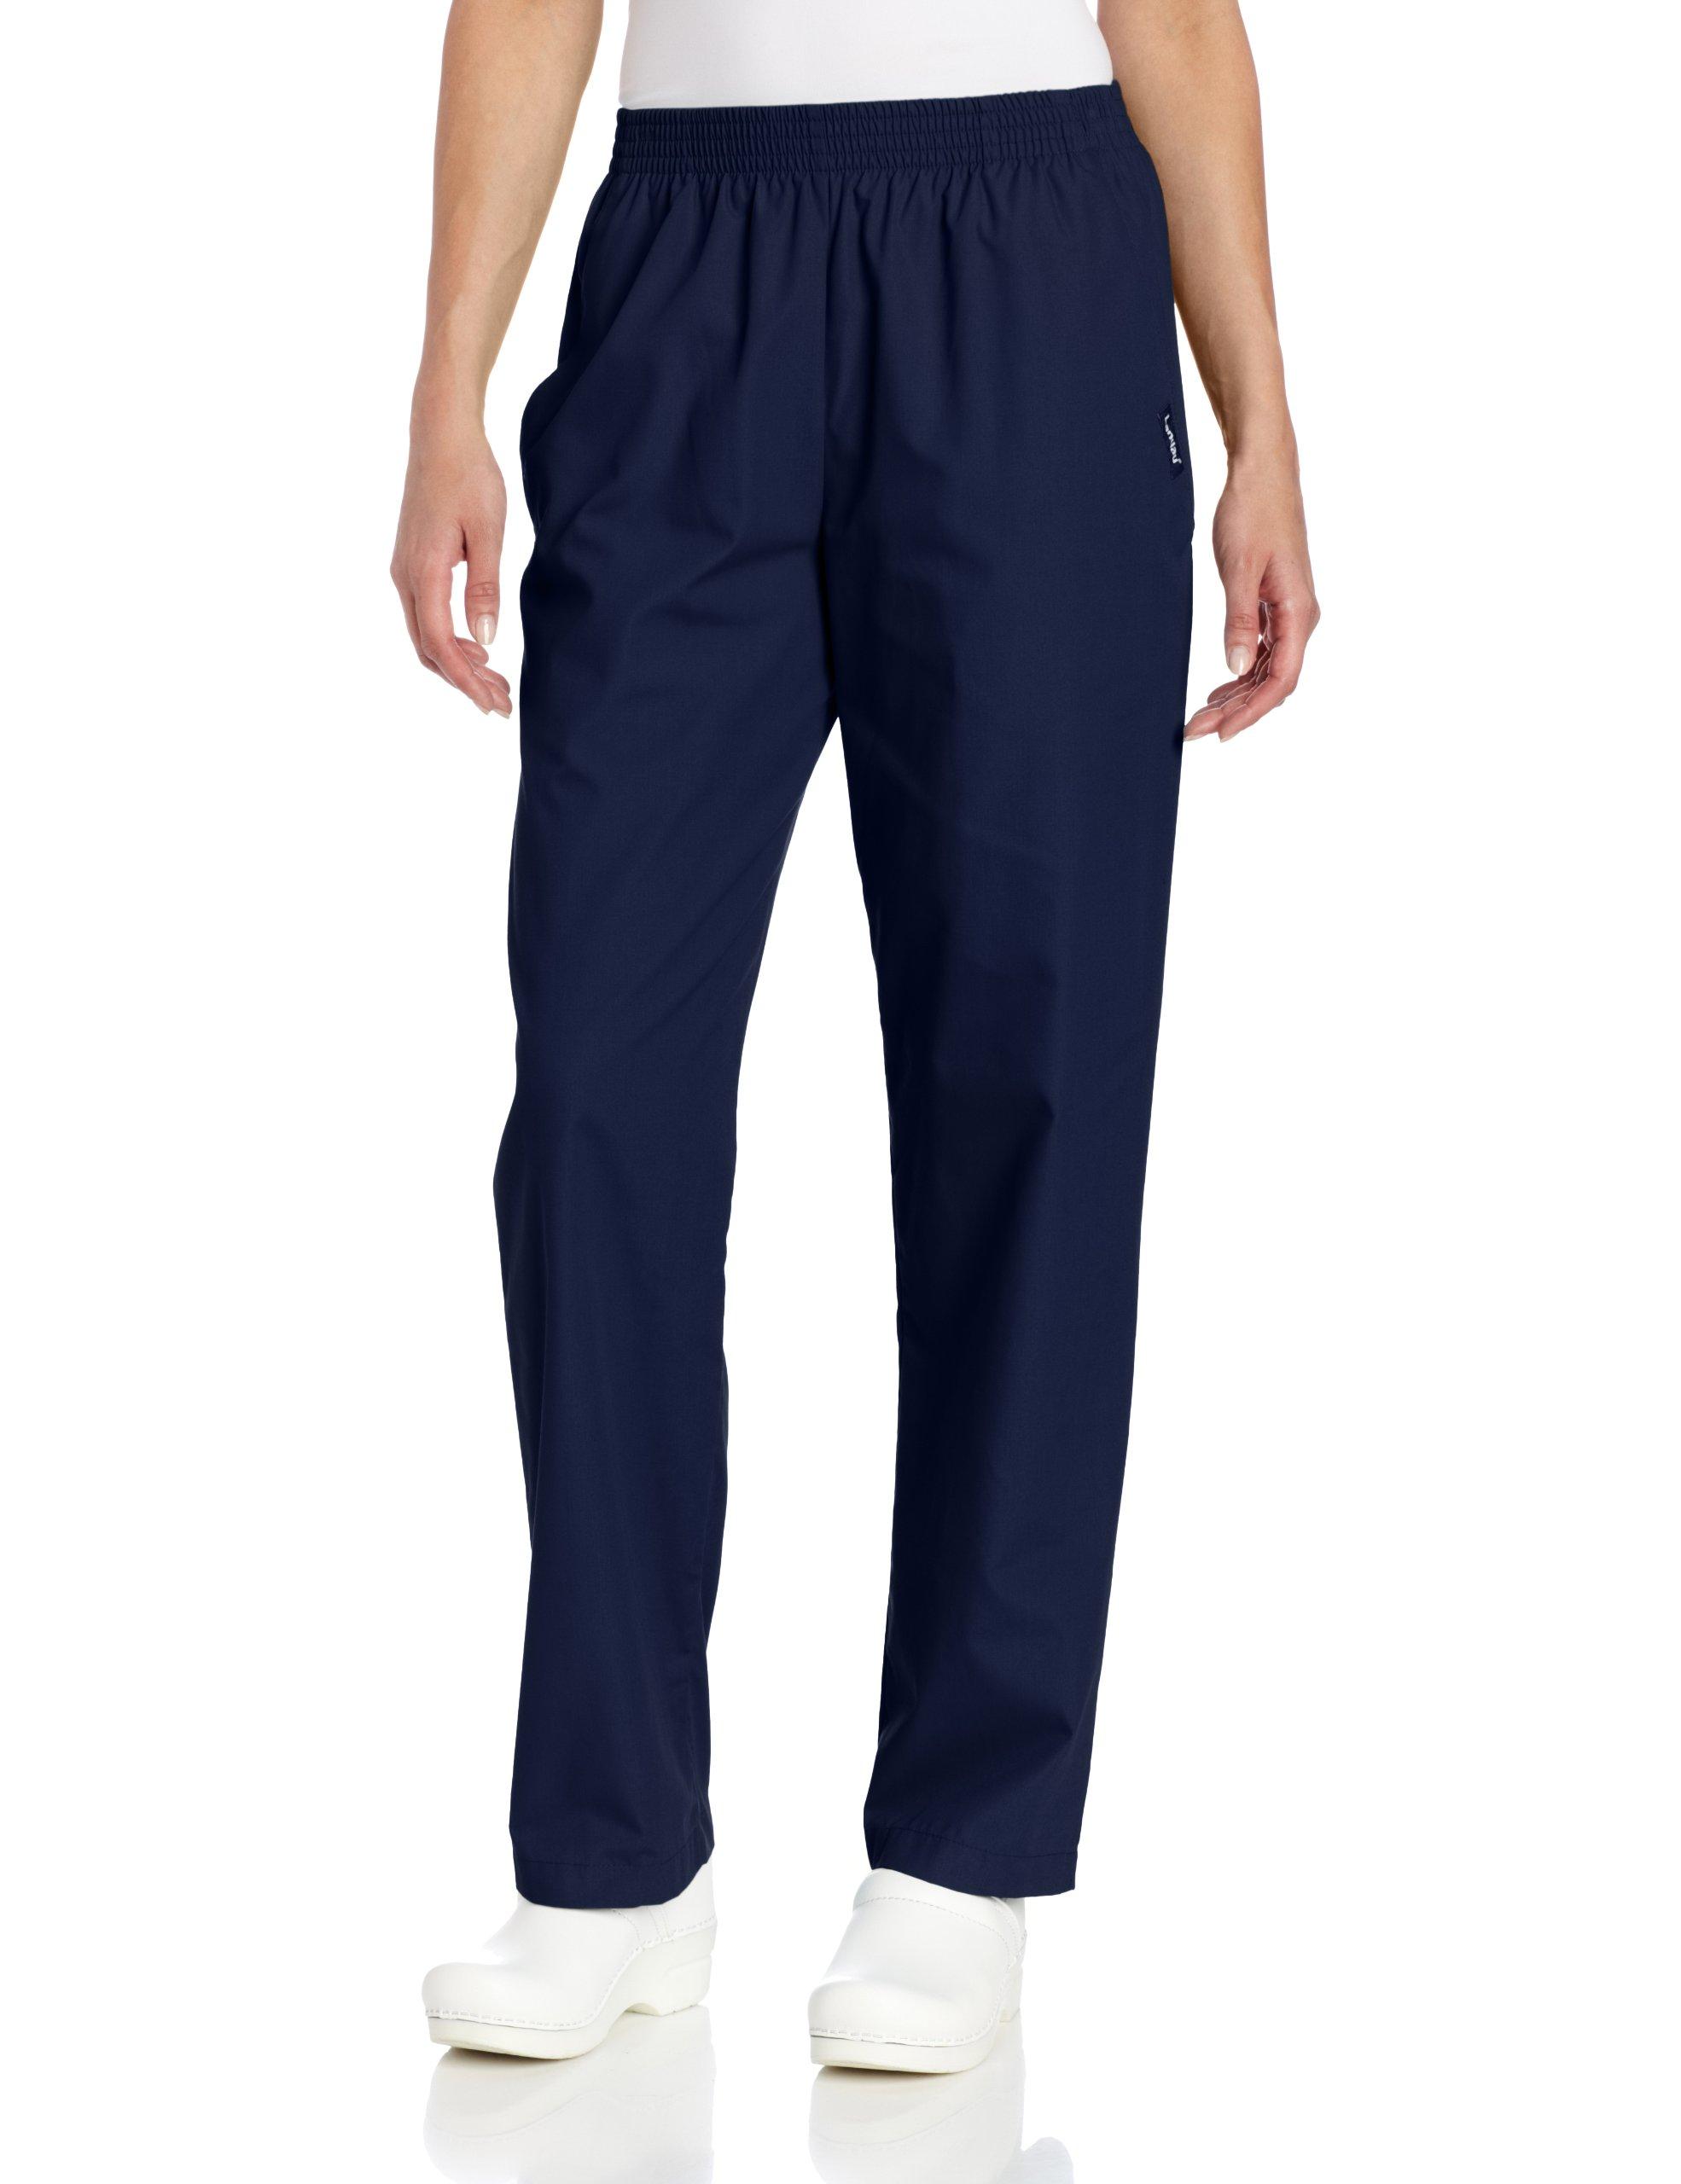 Landau Women's Classic Relaxed Scrub Pant, Navy, 3X-Large